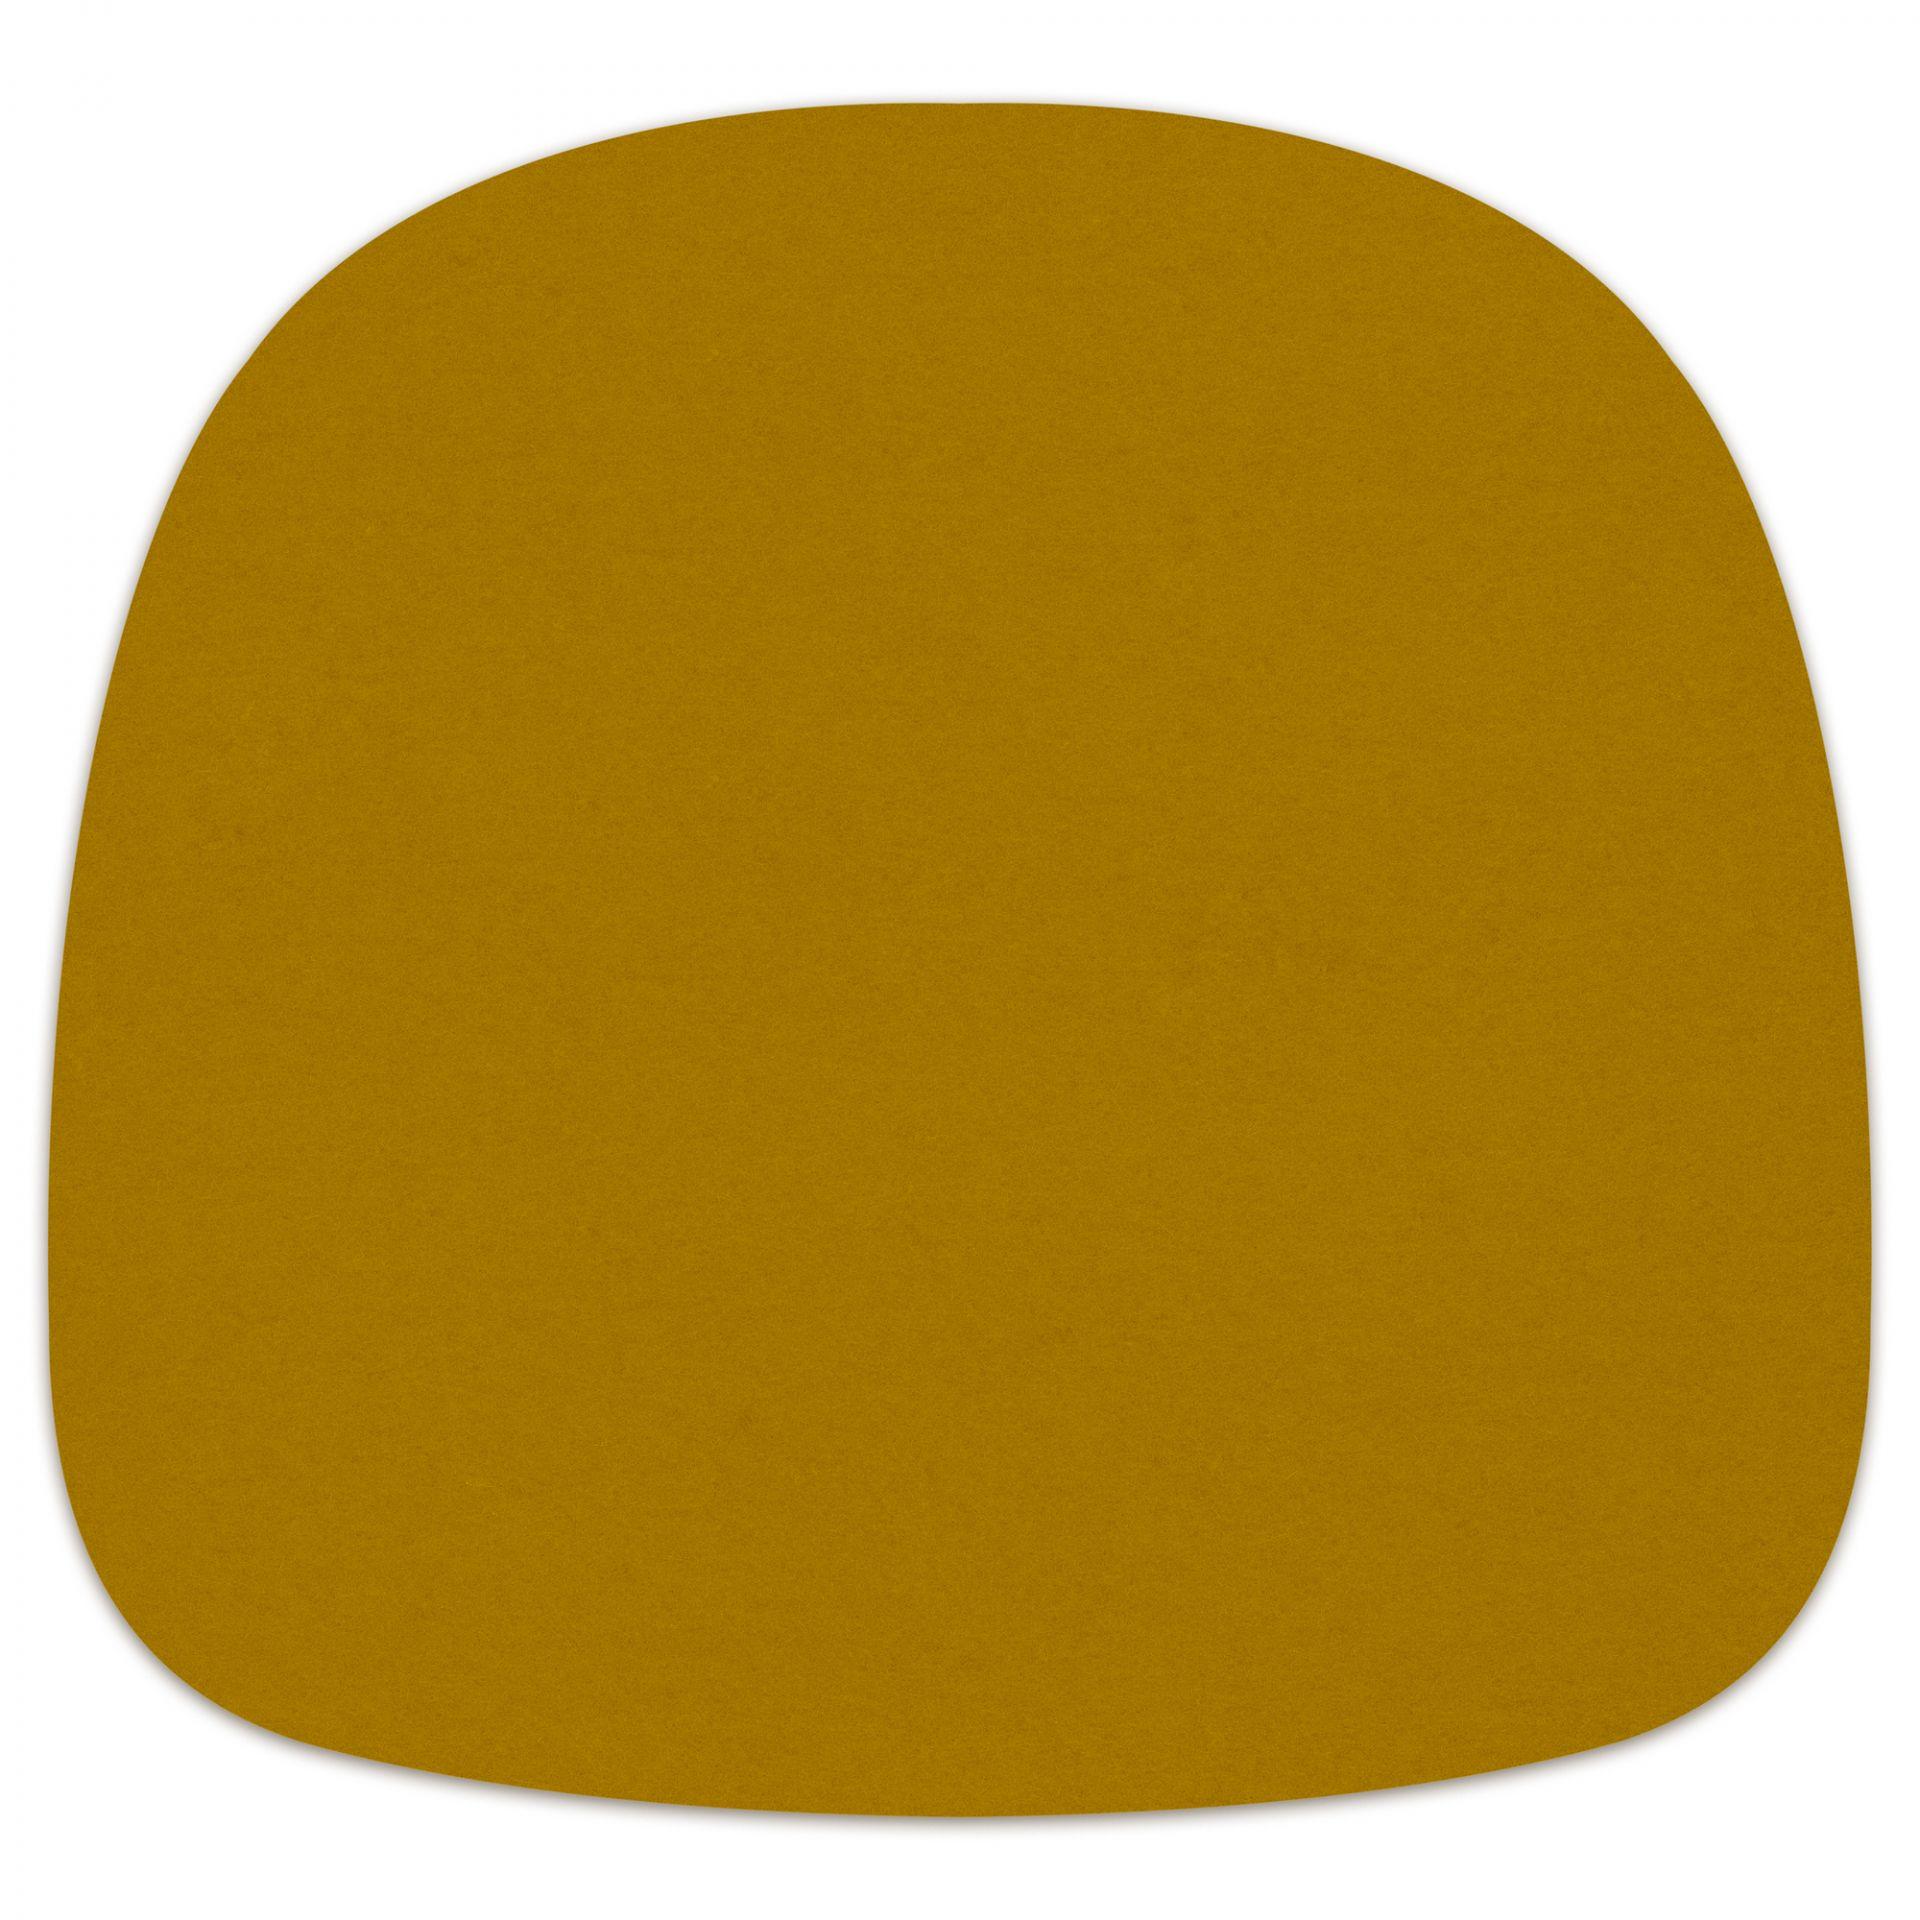 Sitzauflage - Filzauflage About A Chair AAC22 / AAC 22 Senf Hey Sign